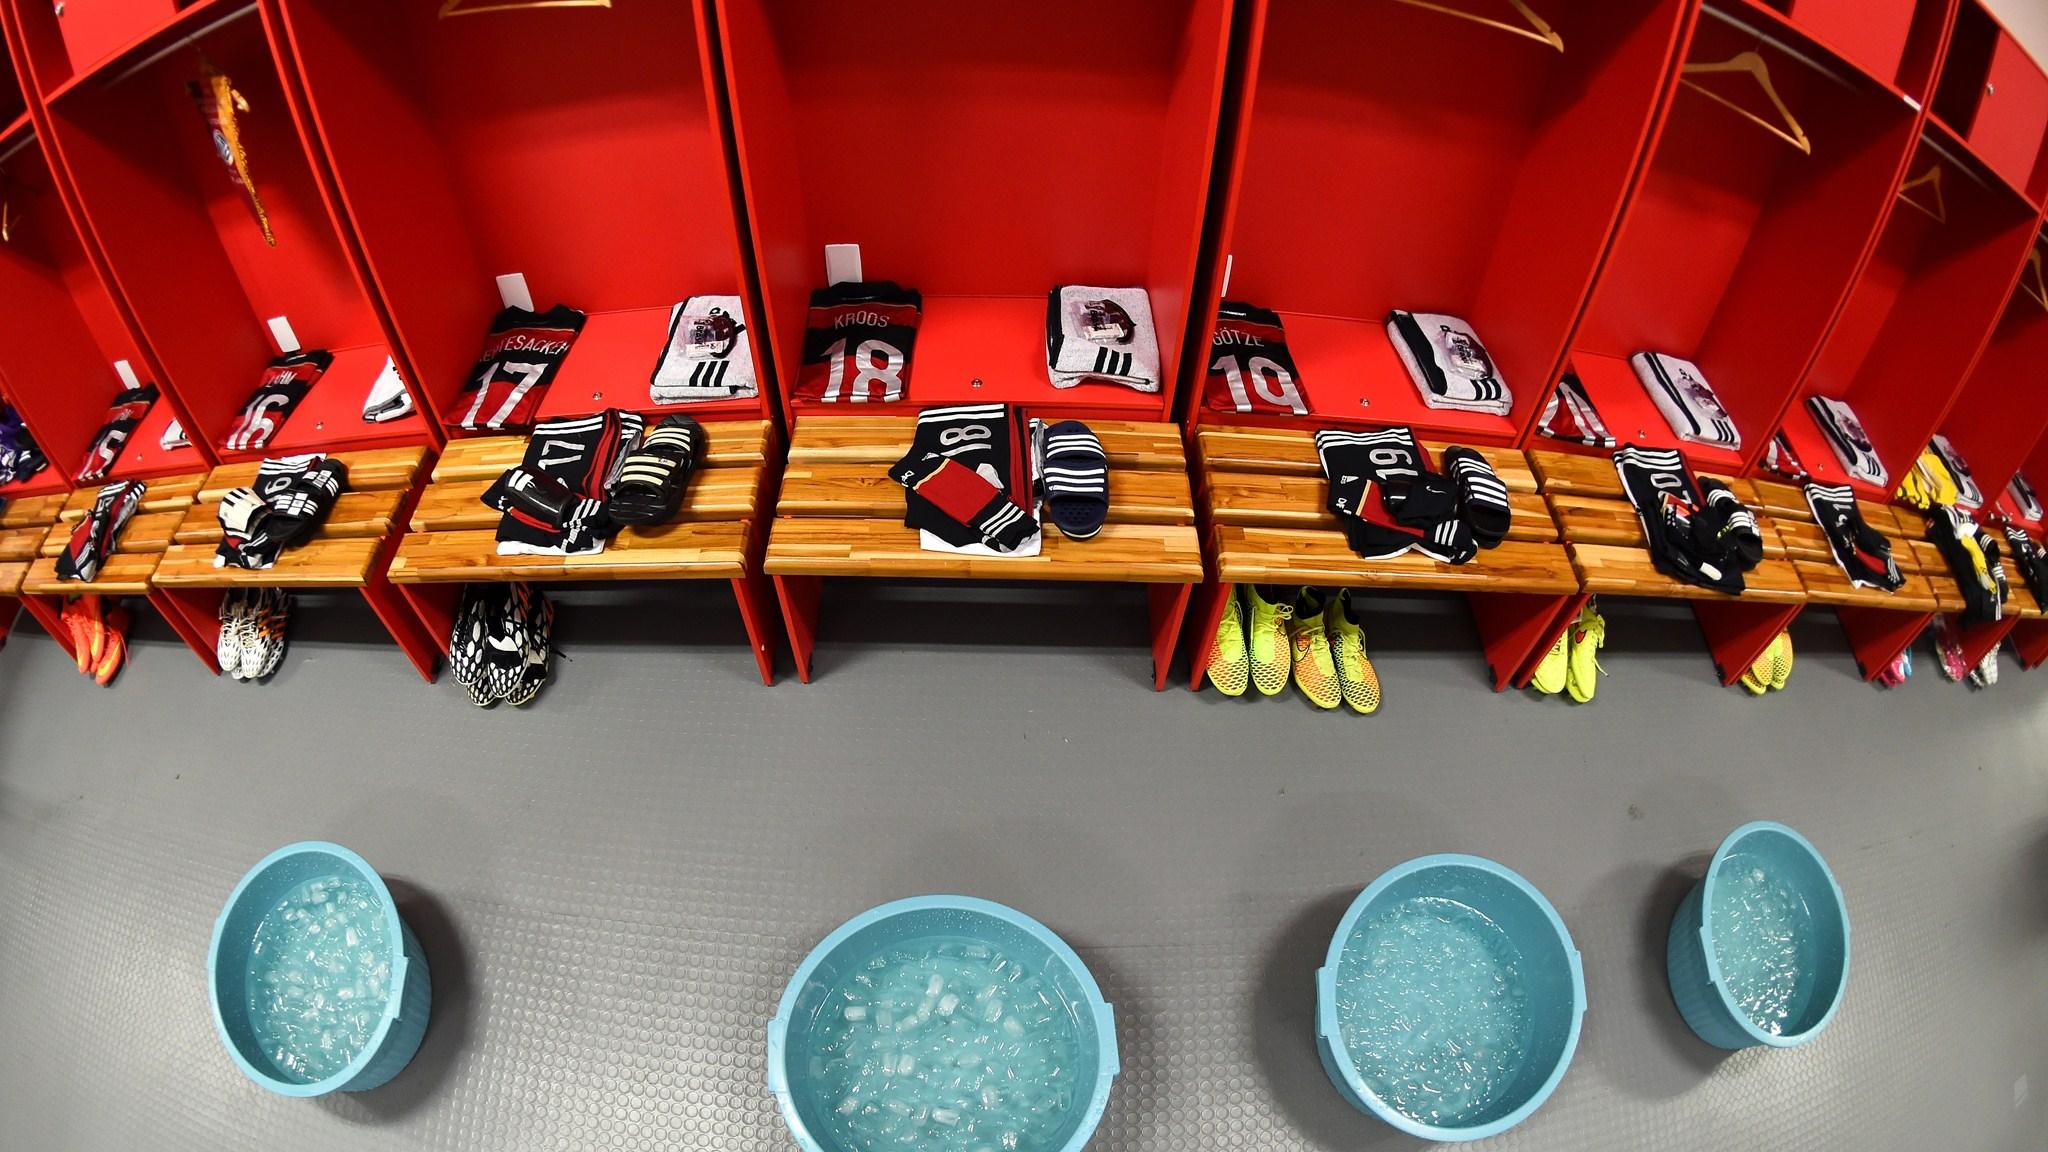 154 - USA-Germany [0-1] -- 26 Jun 2014 - 13-00 - kuaza